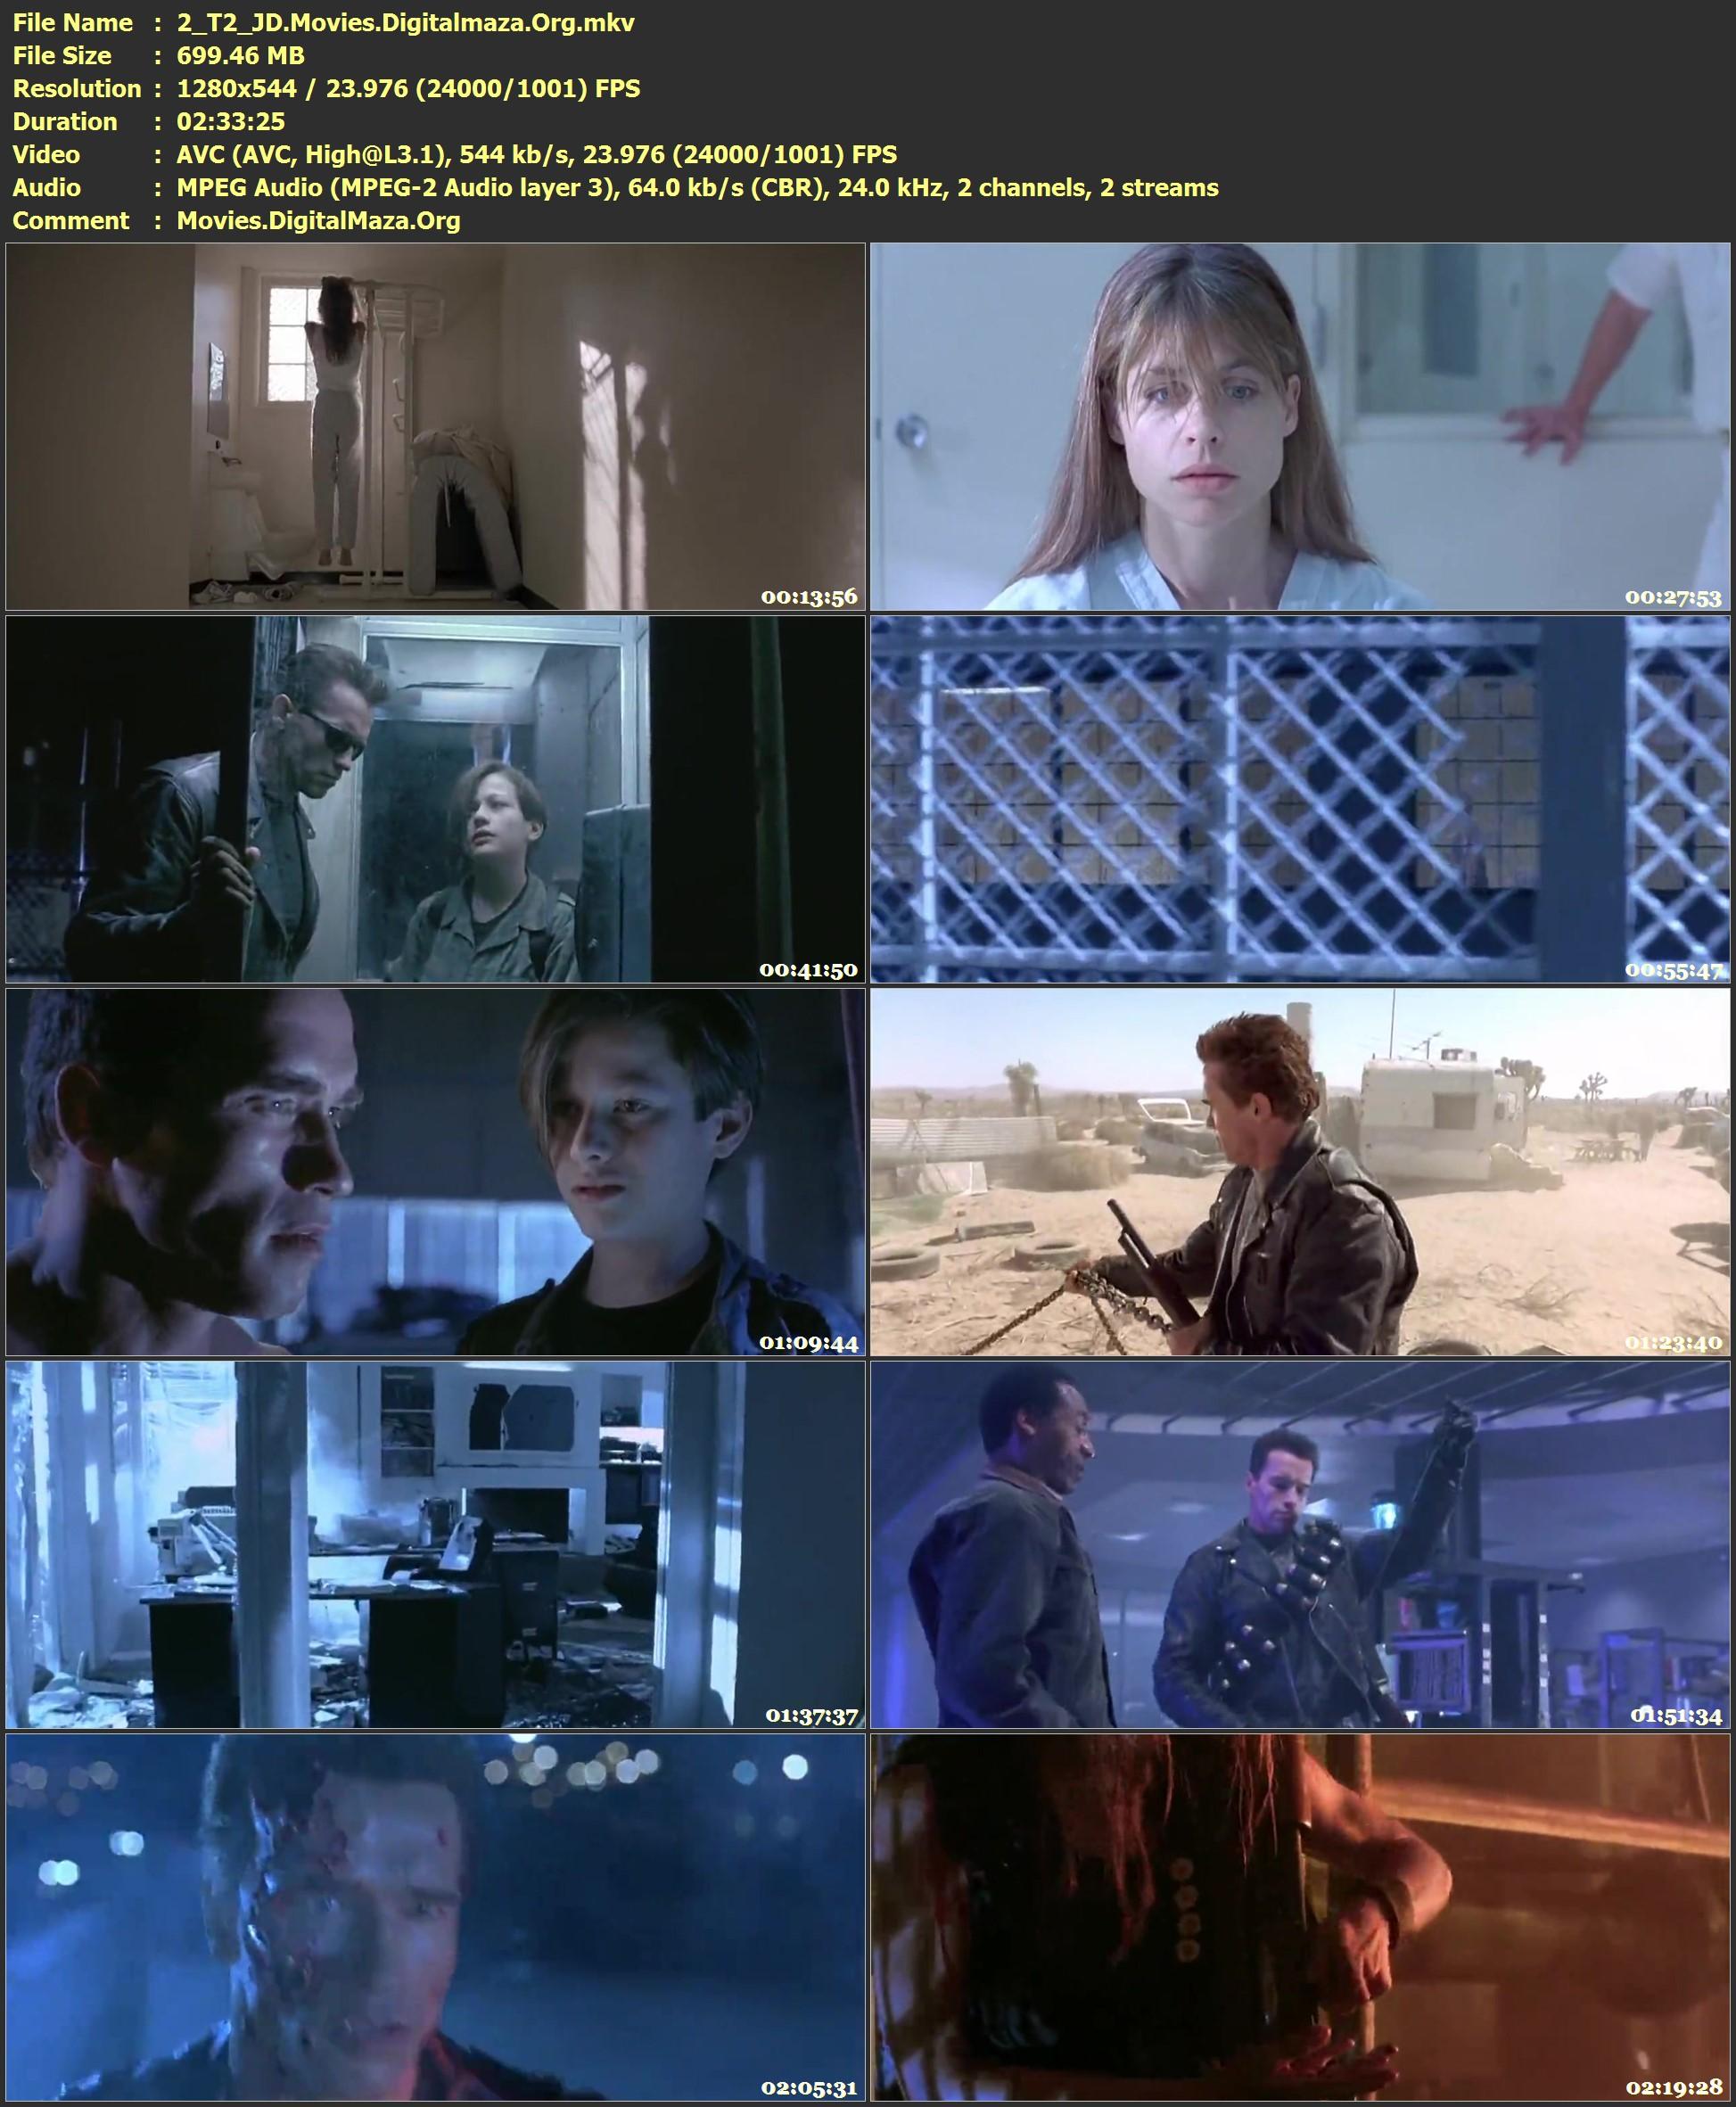 https://image.ibb.co/dpGQSc/2_T2_JD_Movies_Digitalmaza_Org_mkv.jpg